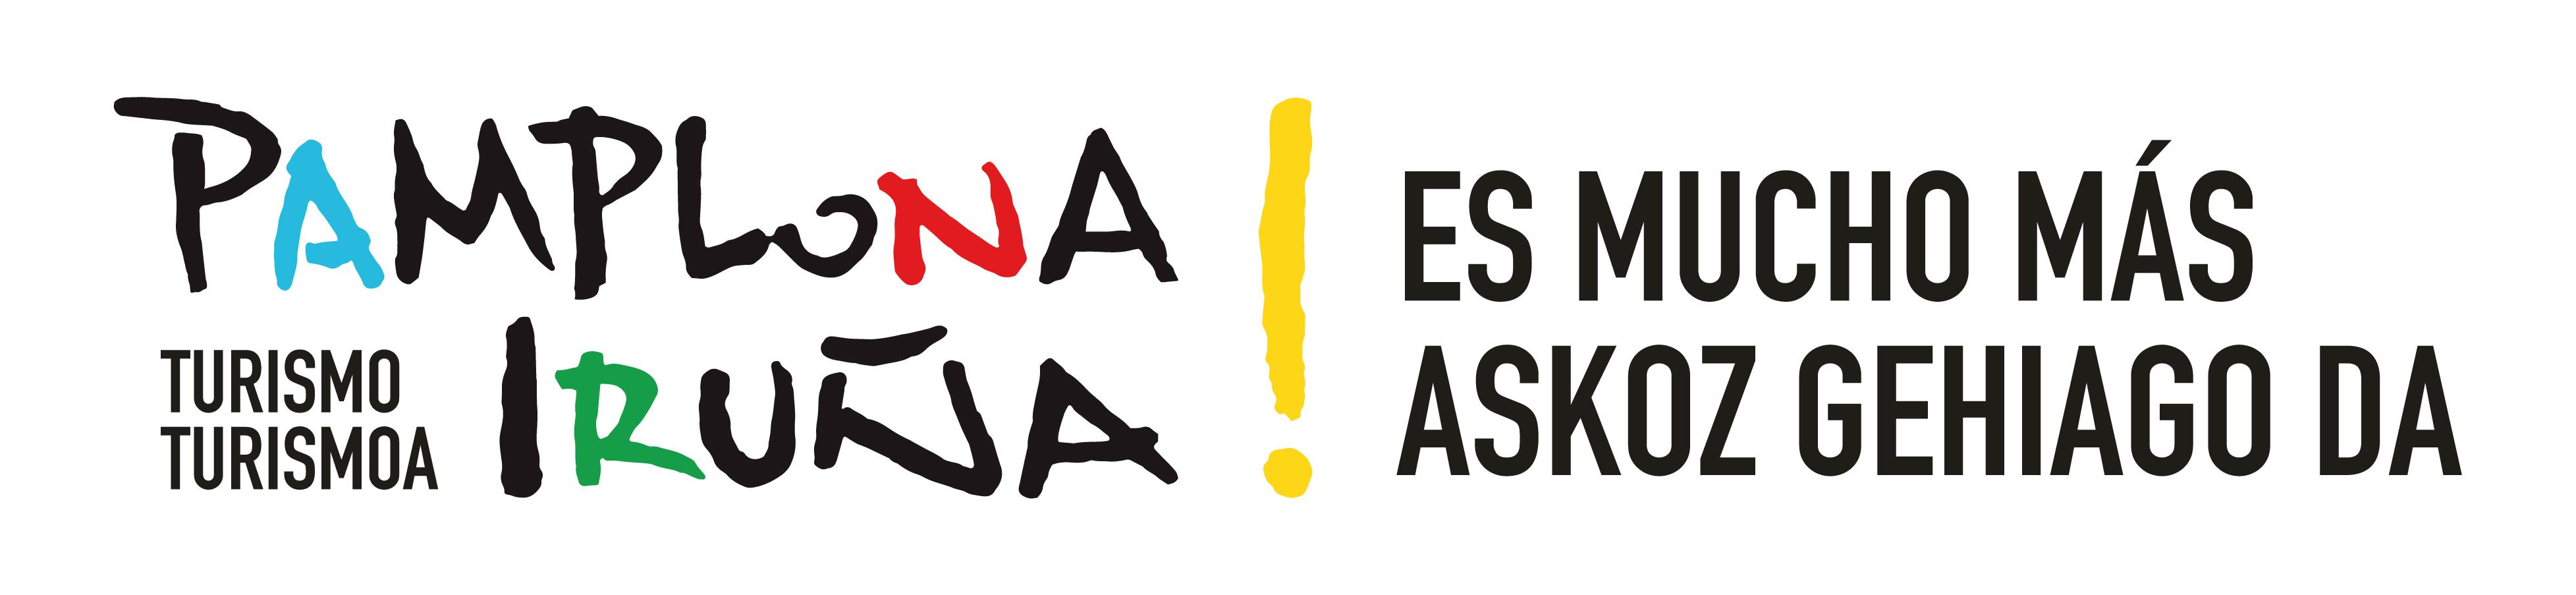 Pamplona / iruña es mucho mas / askoz gehiago da